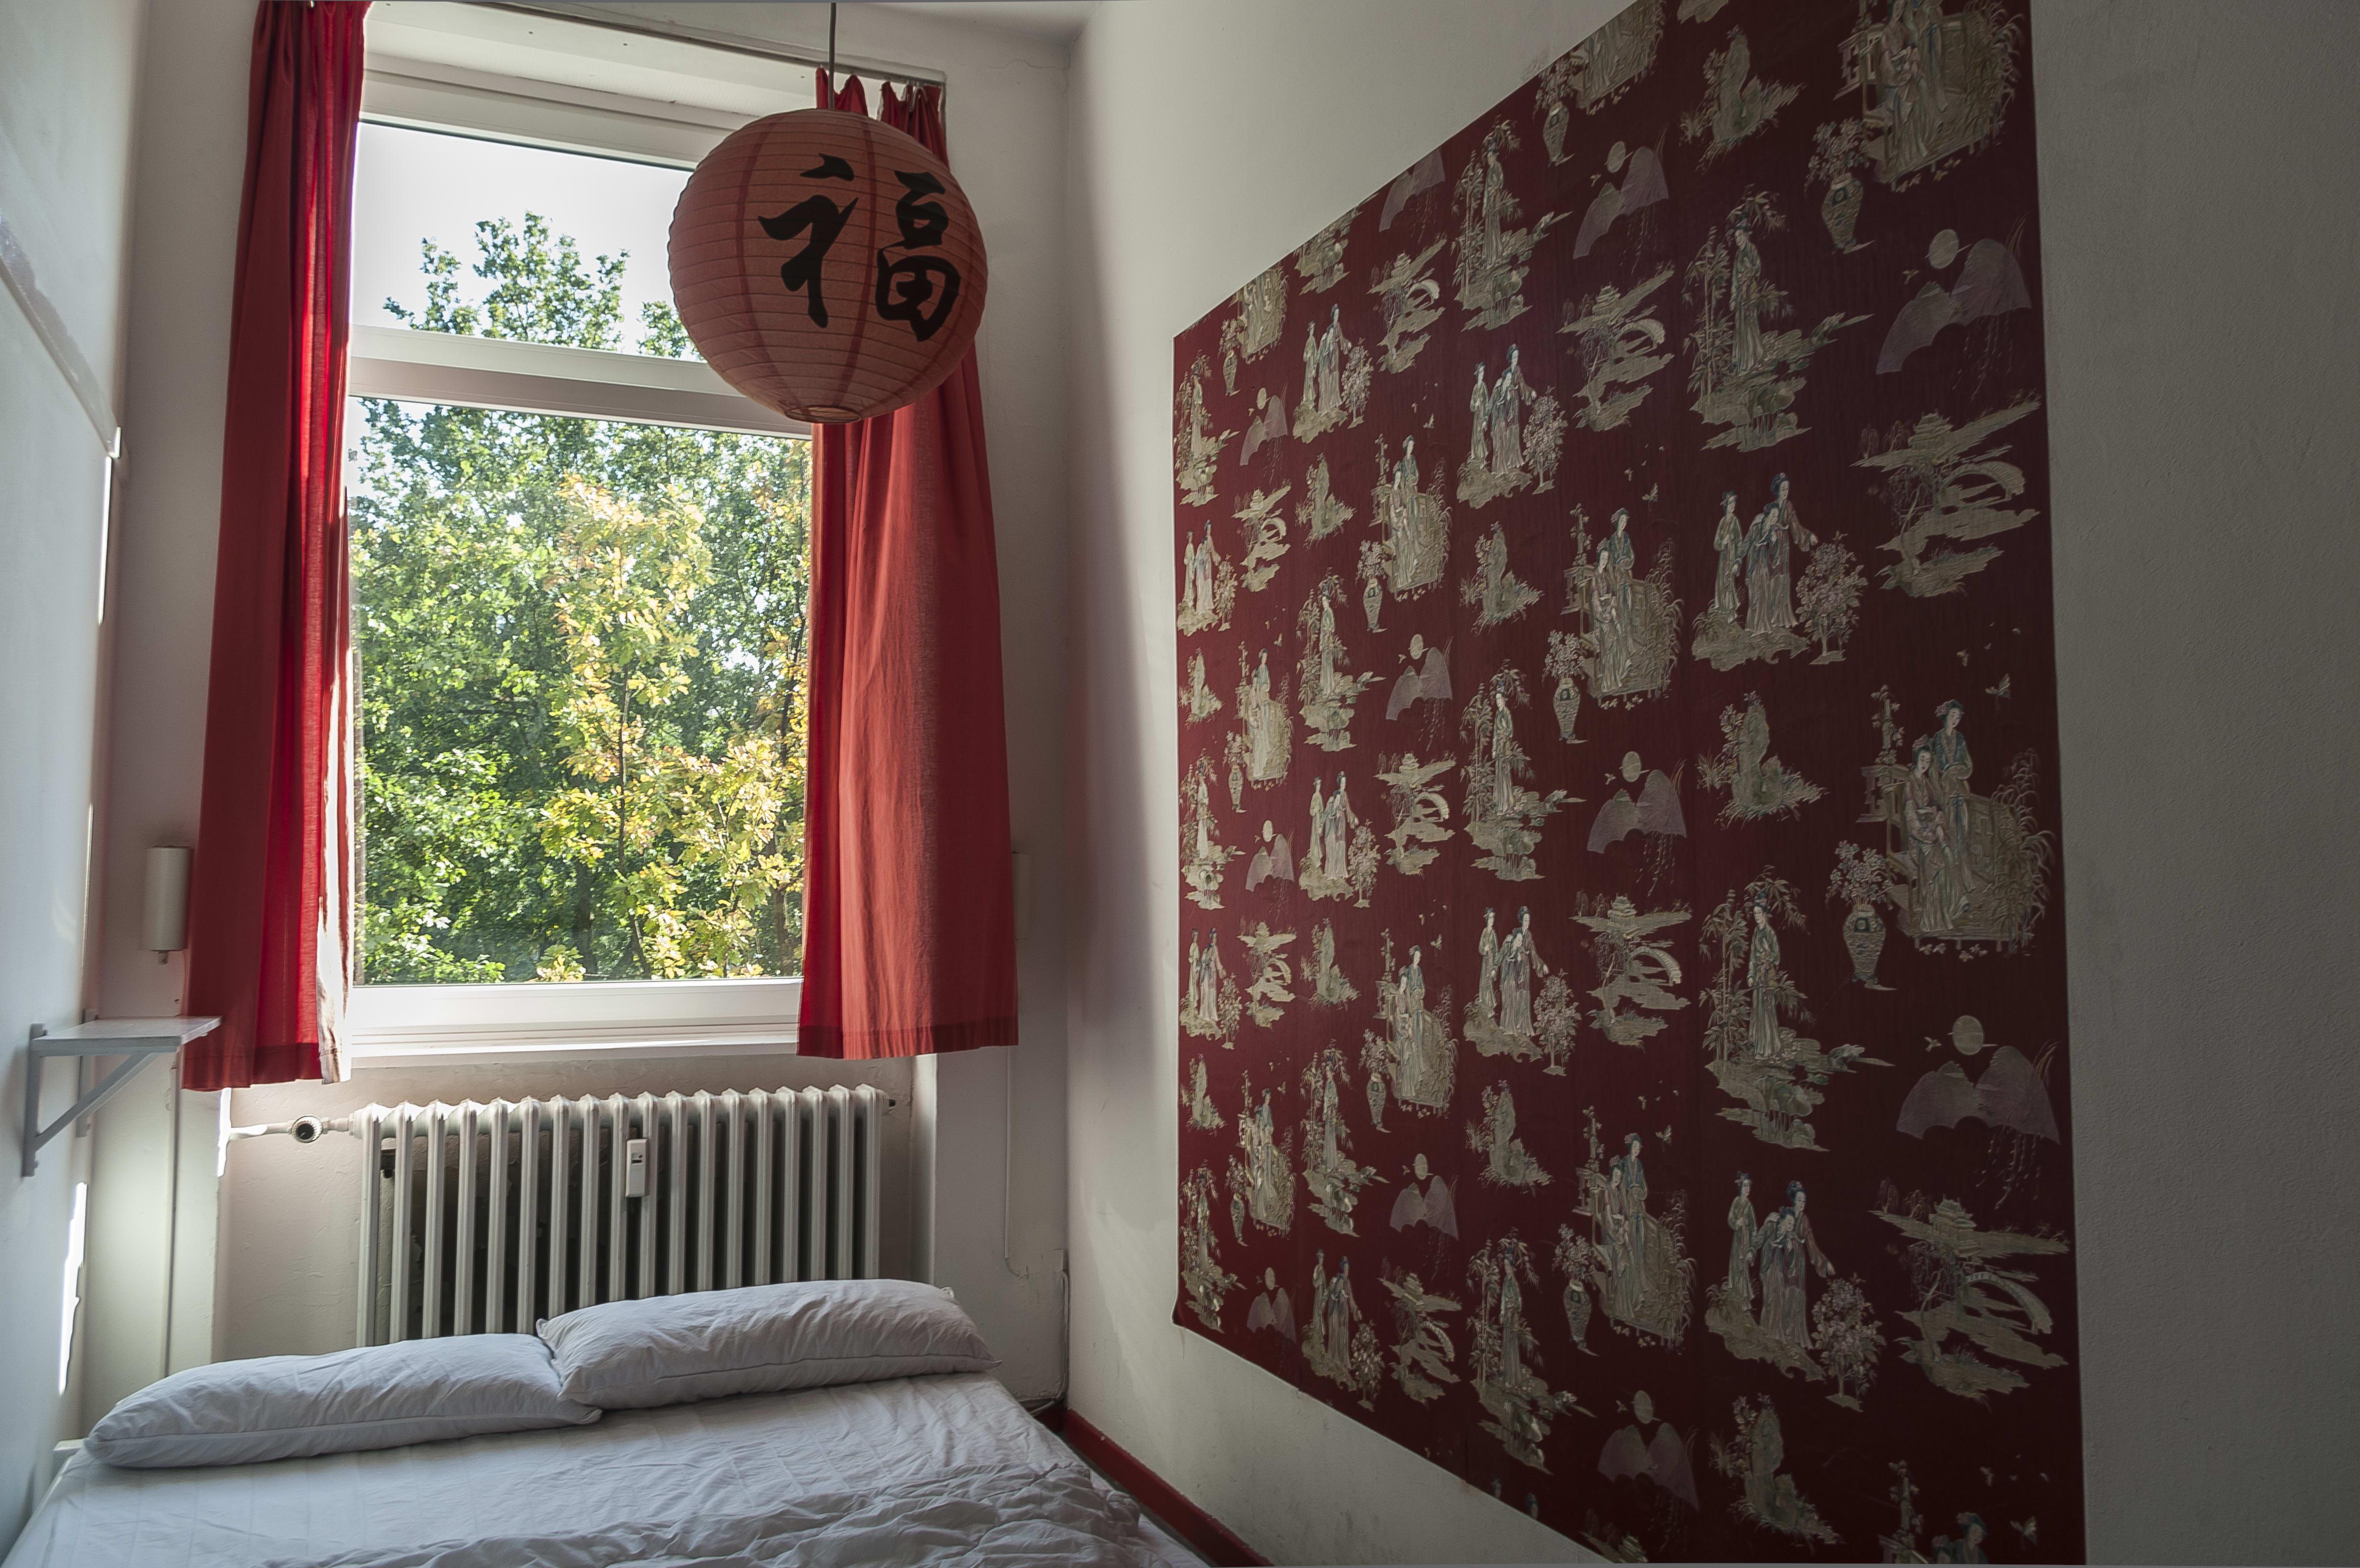 Instant Sleep Backpacker Hostel